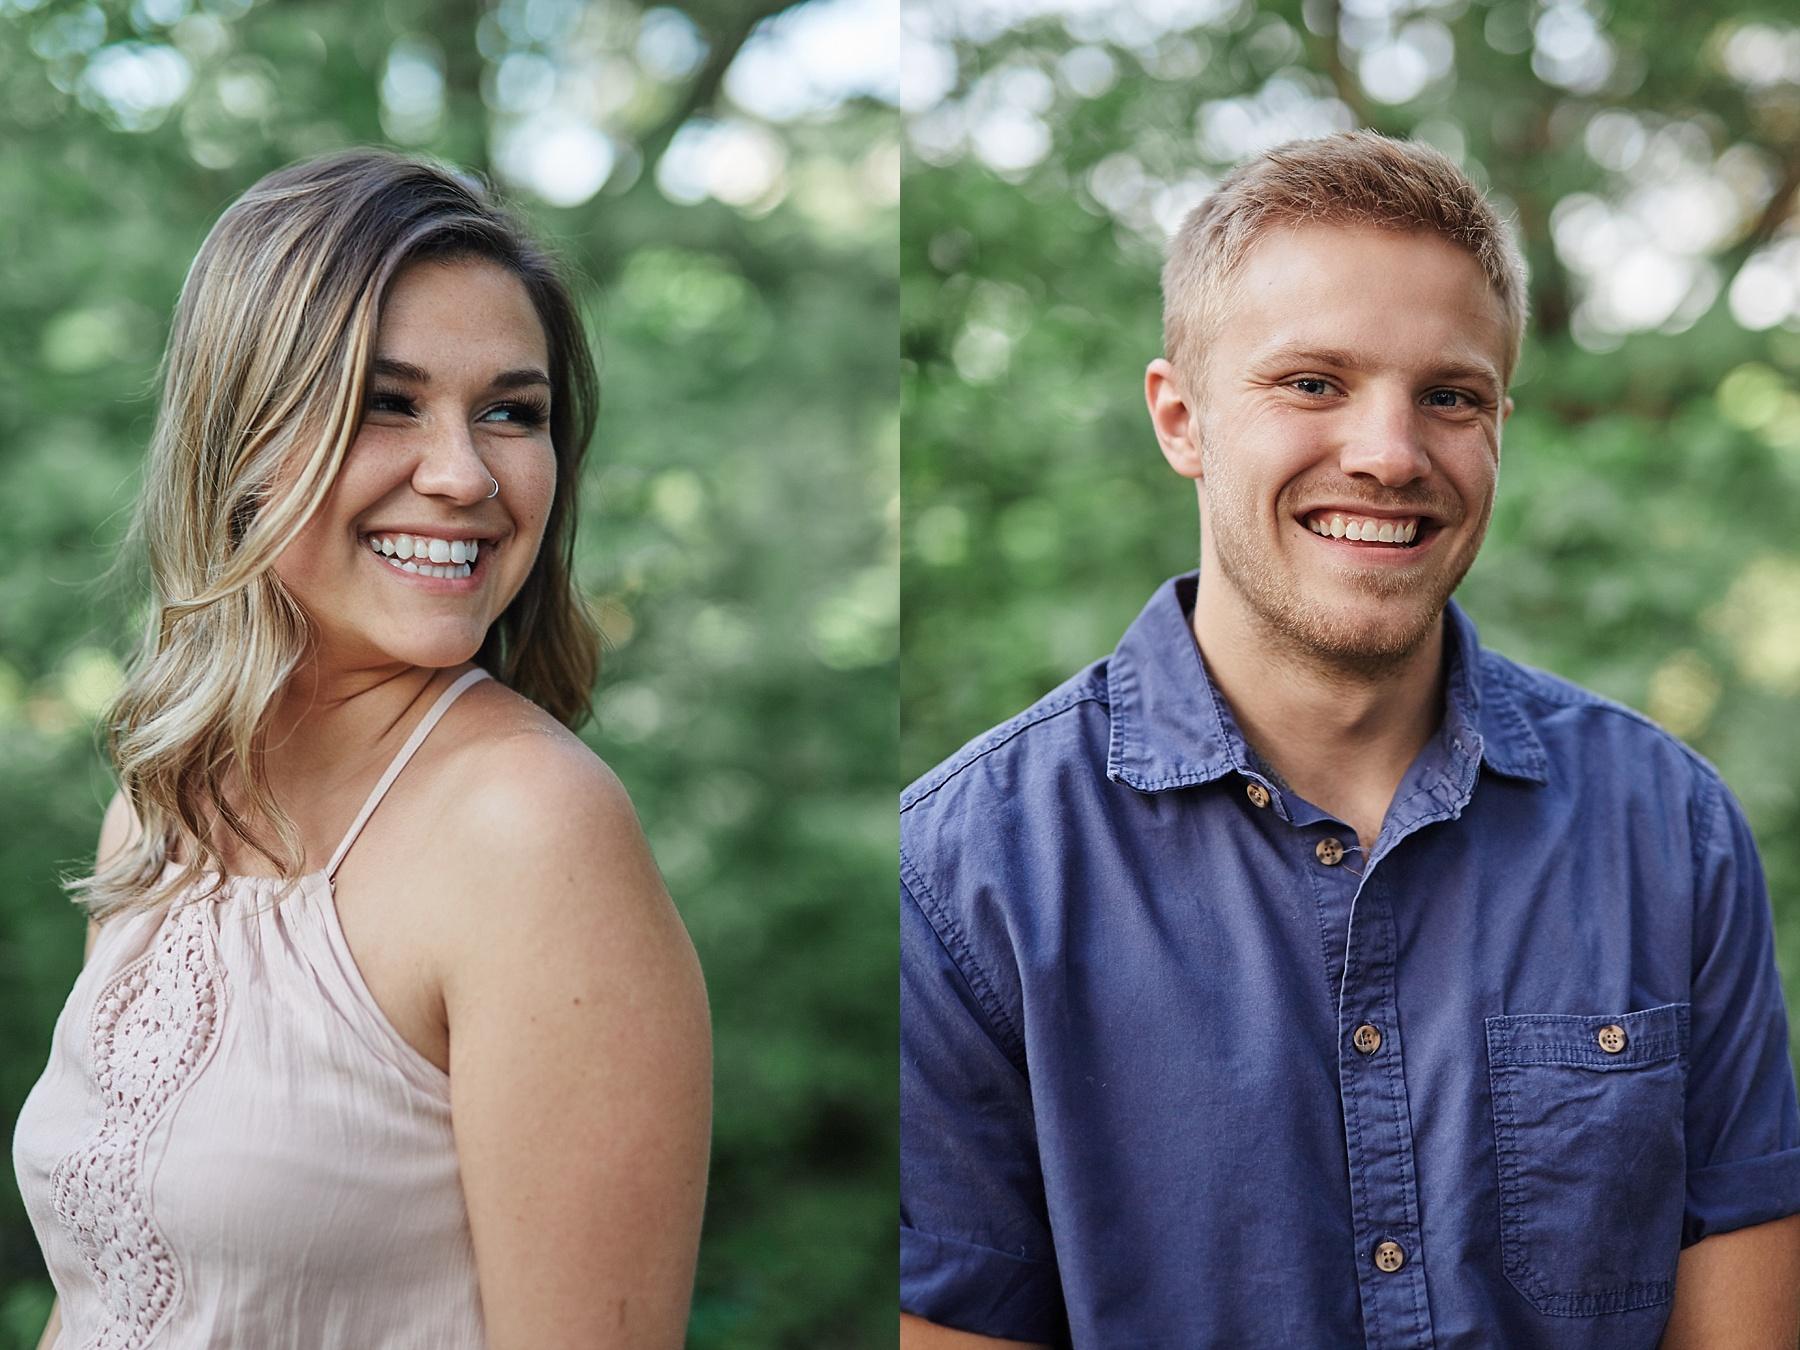 Destination-Engagement-Taylors-Falls-Minnesota-Minneapolis-Mayowood-Stone-Barn_0063.jpg